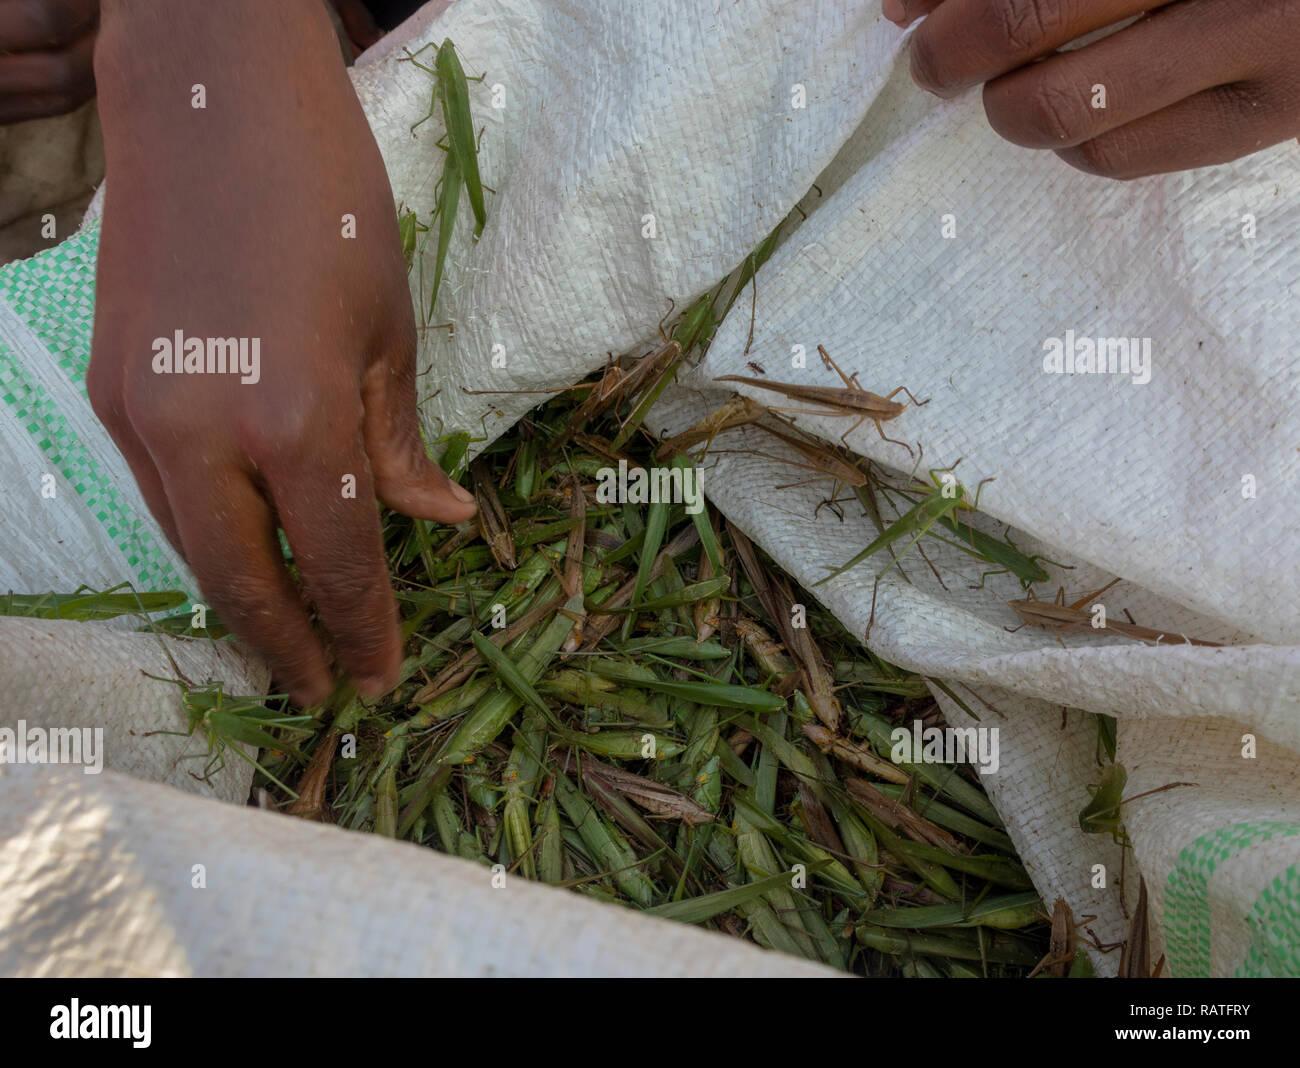 Beutel der erfassten katydids (tettigoniidae) zum Verkauf als nsenene Snack Food, Uganda, Afrika Stockbild